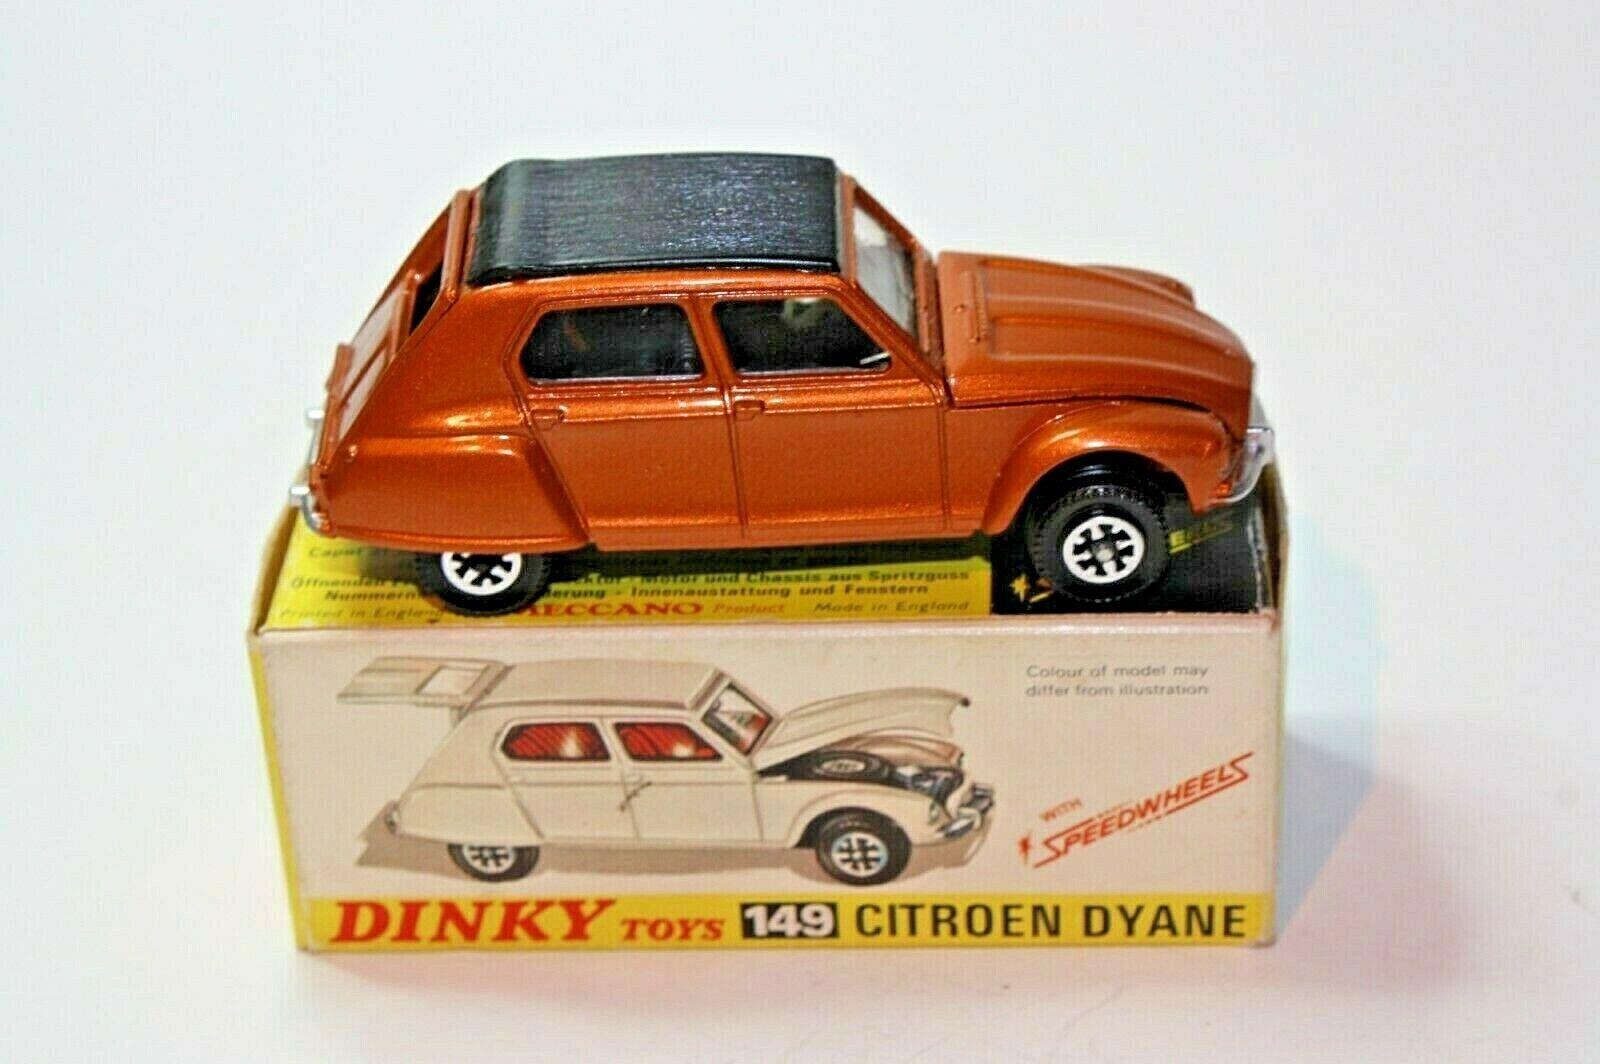 Dinky 149 Citroen Dyane, Mint Condition in Good Original Box